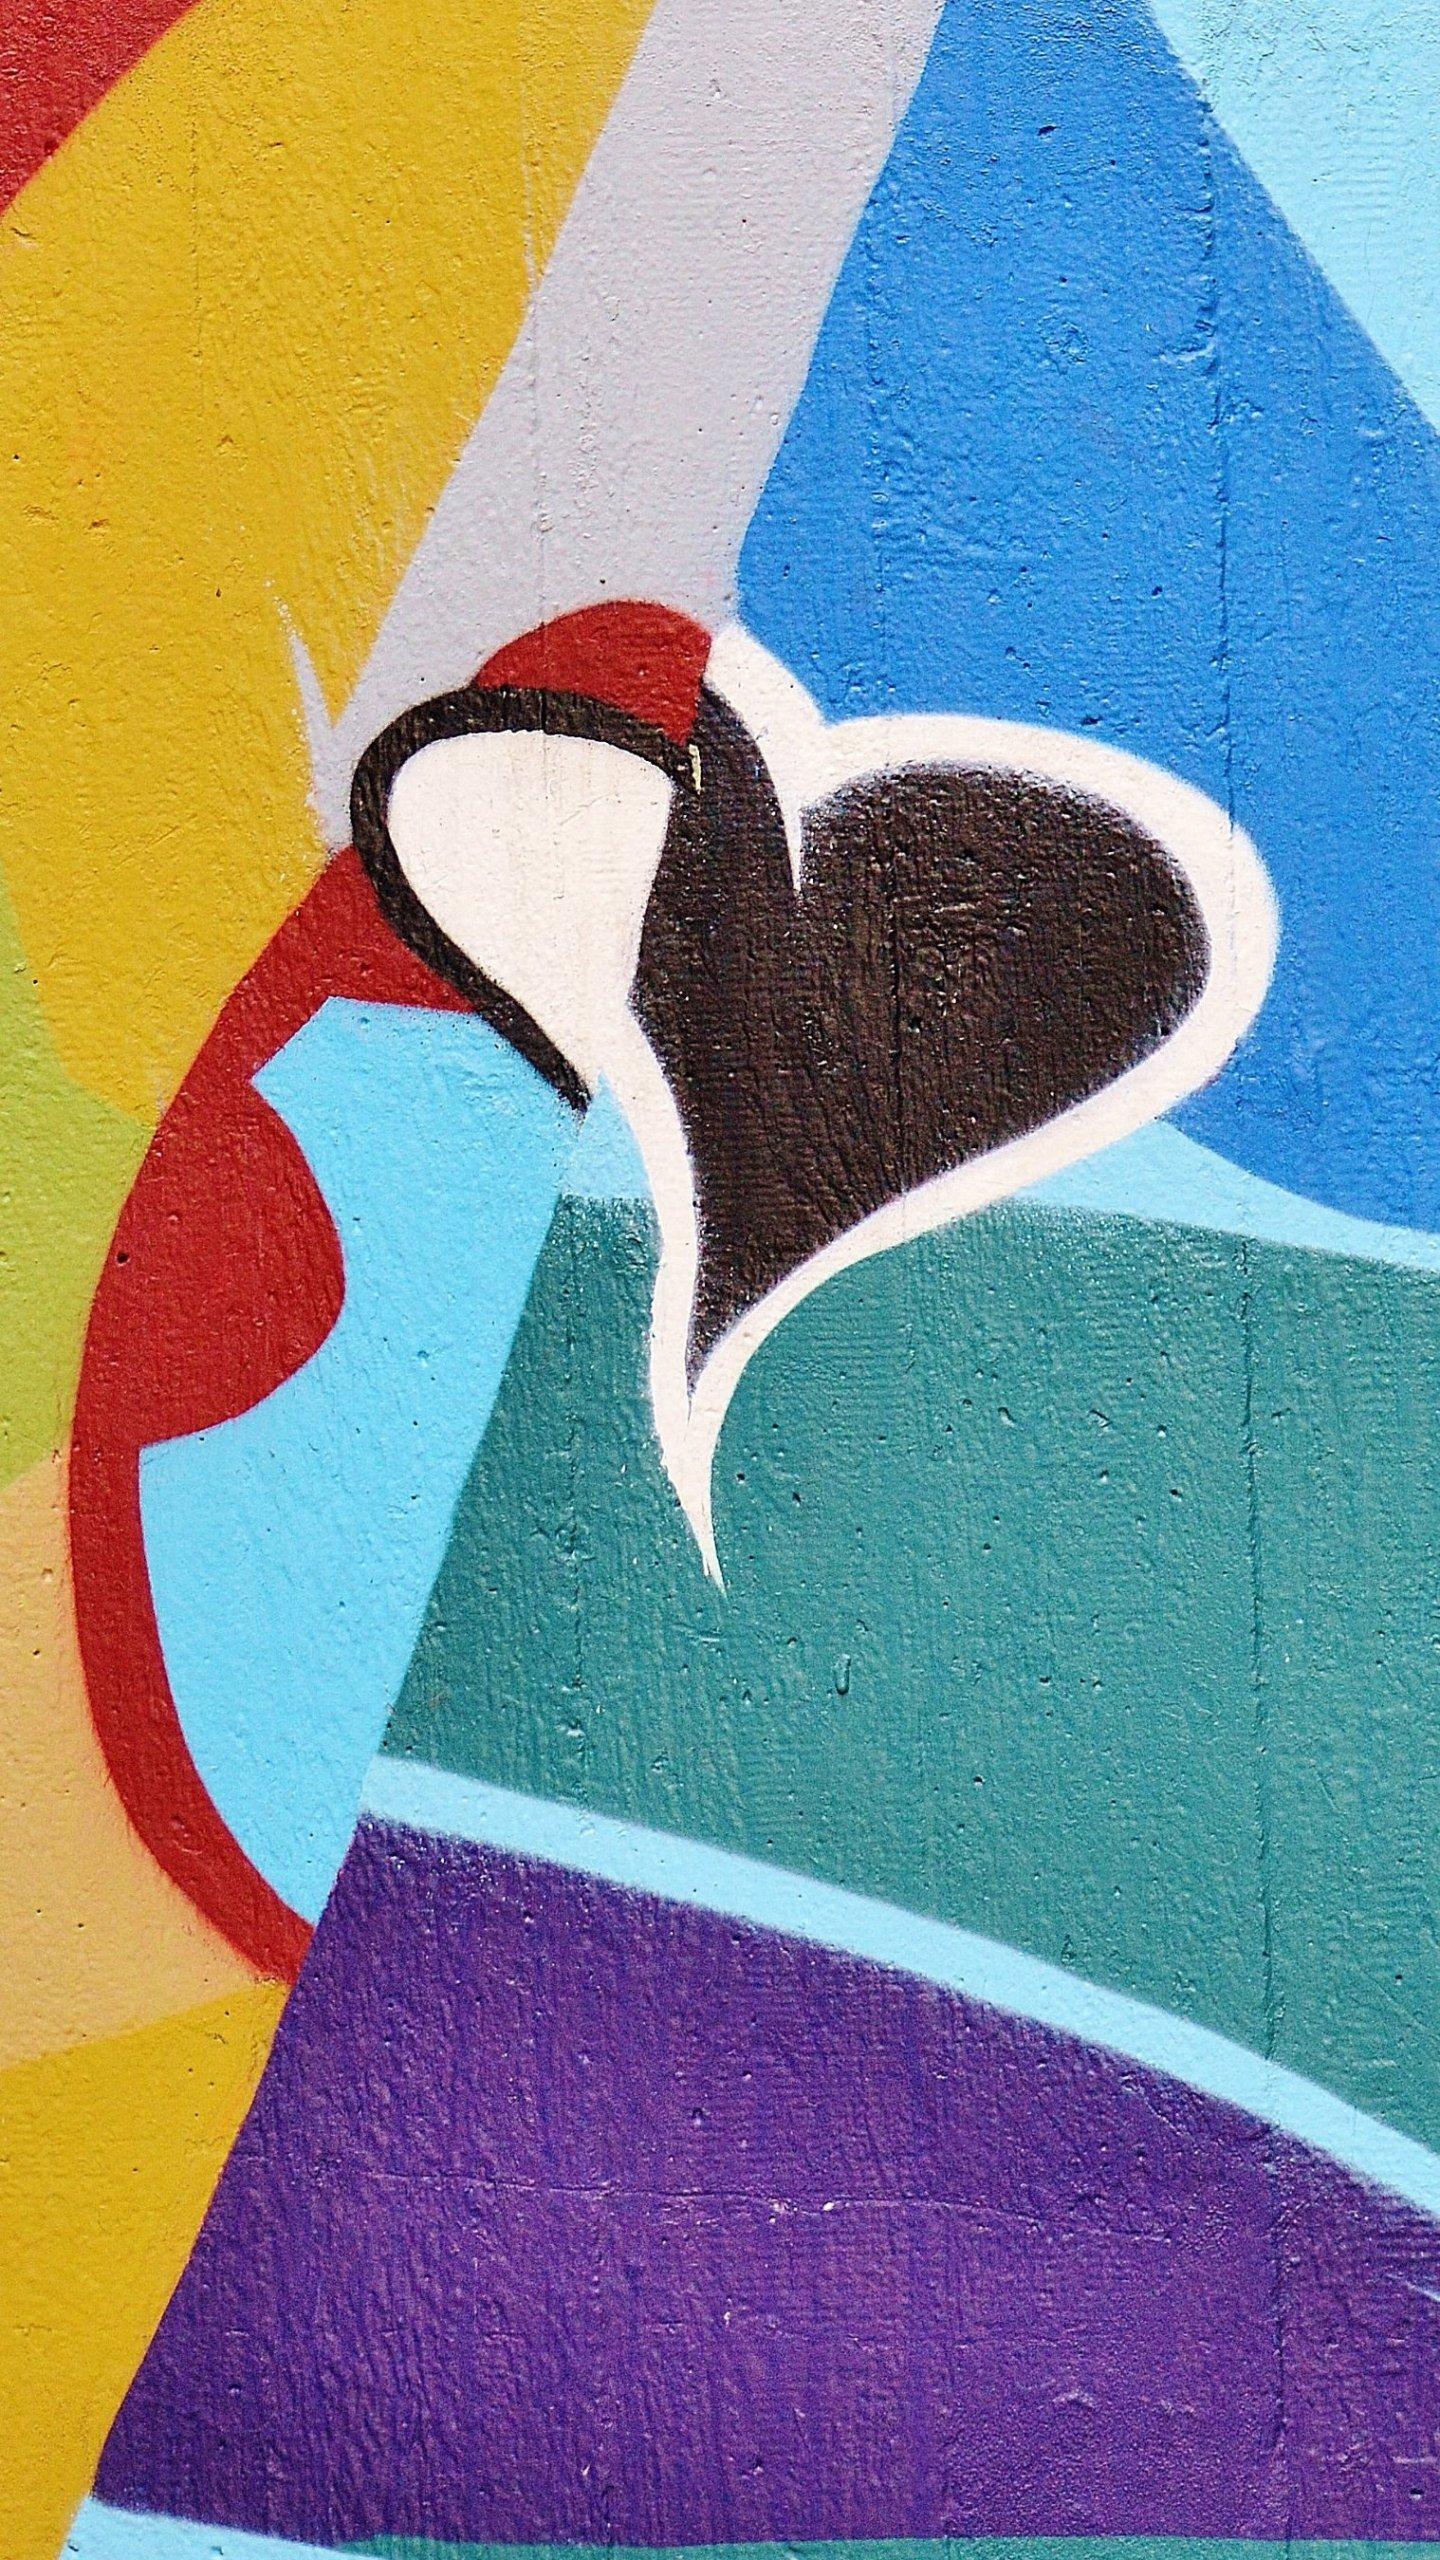 Heart Graffiti Wallpaper Iphone Android Desktop Backgrounds